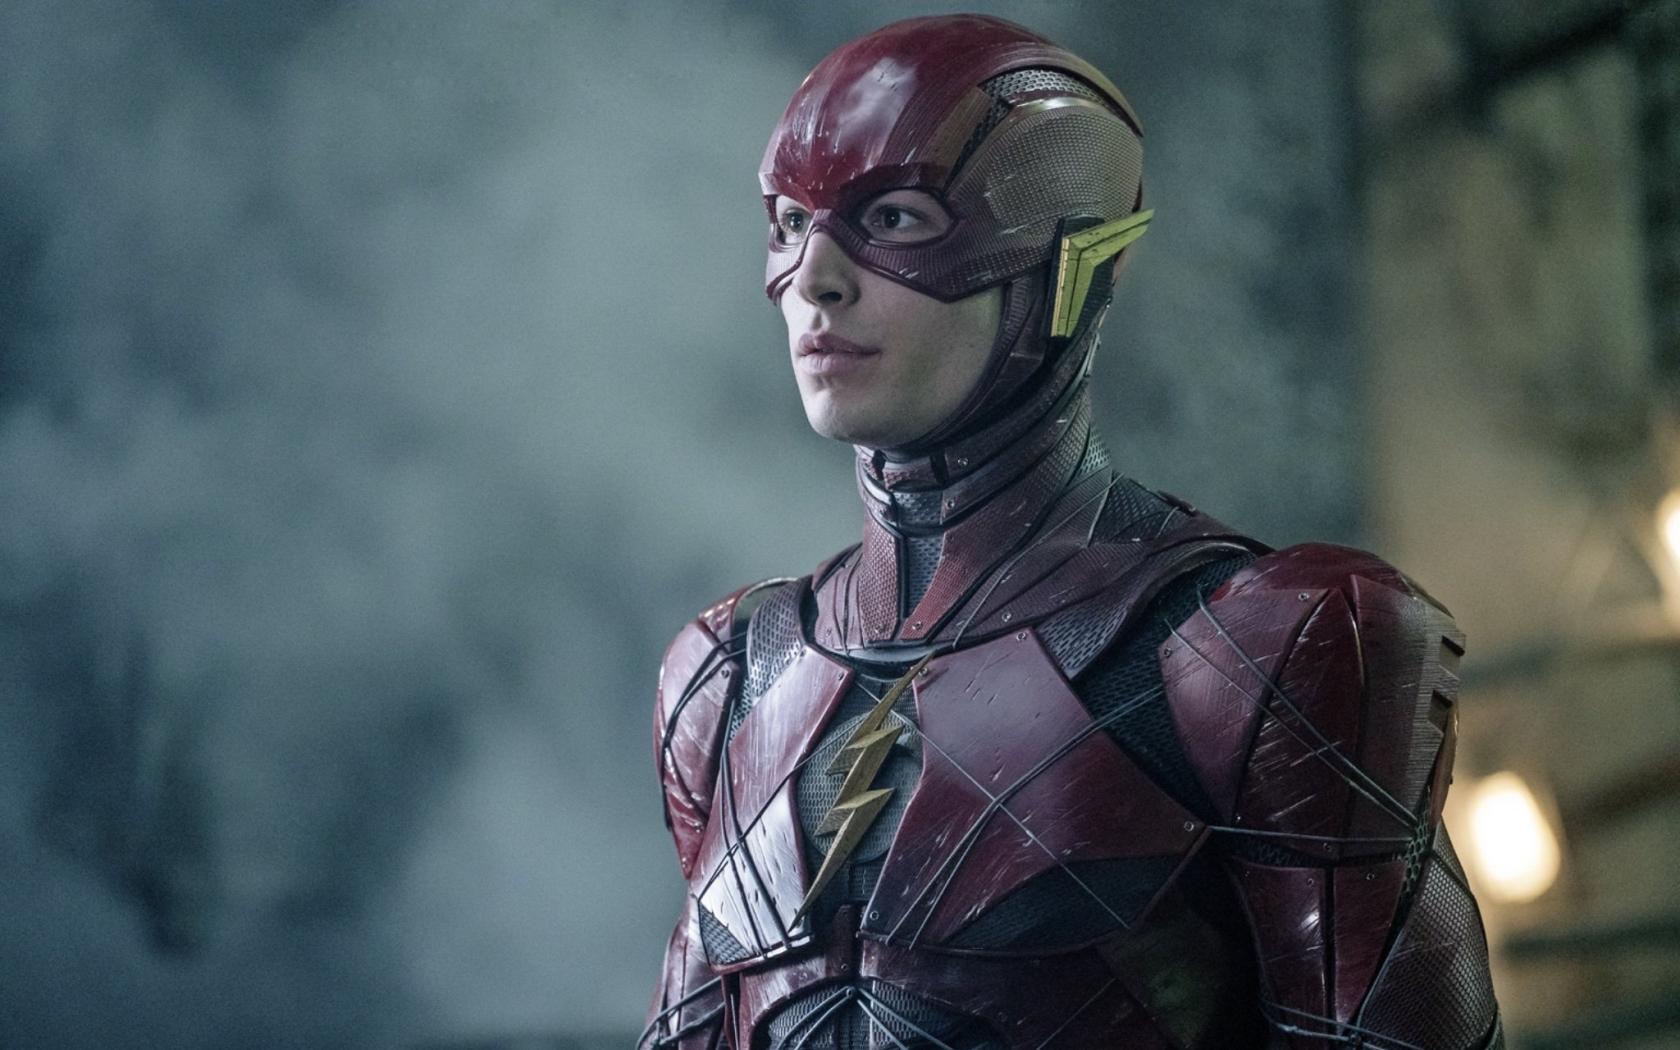 Wallpaper Justice League 2017 Movies Flash Superman: Flash Justice League 2017, Full HD 2K Wallpaper